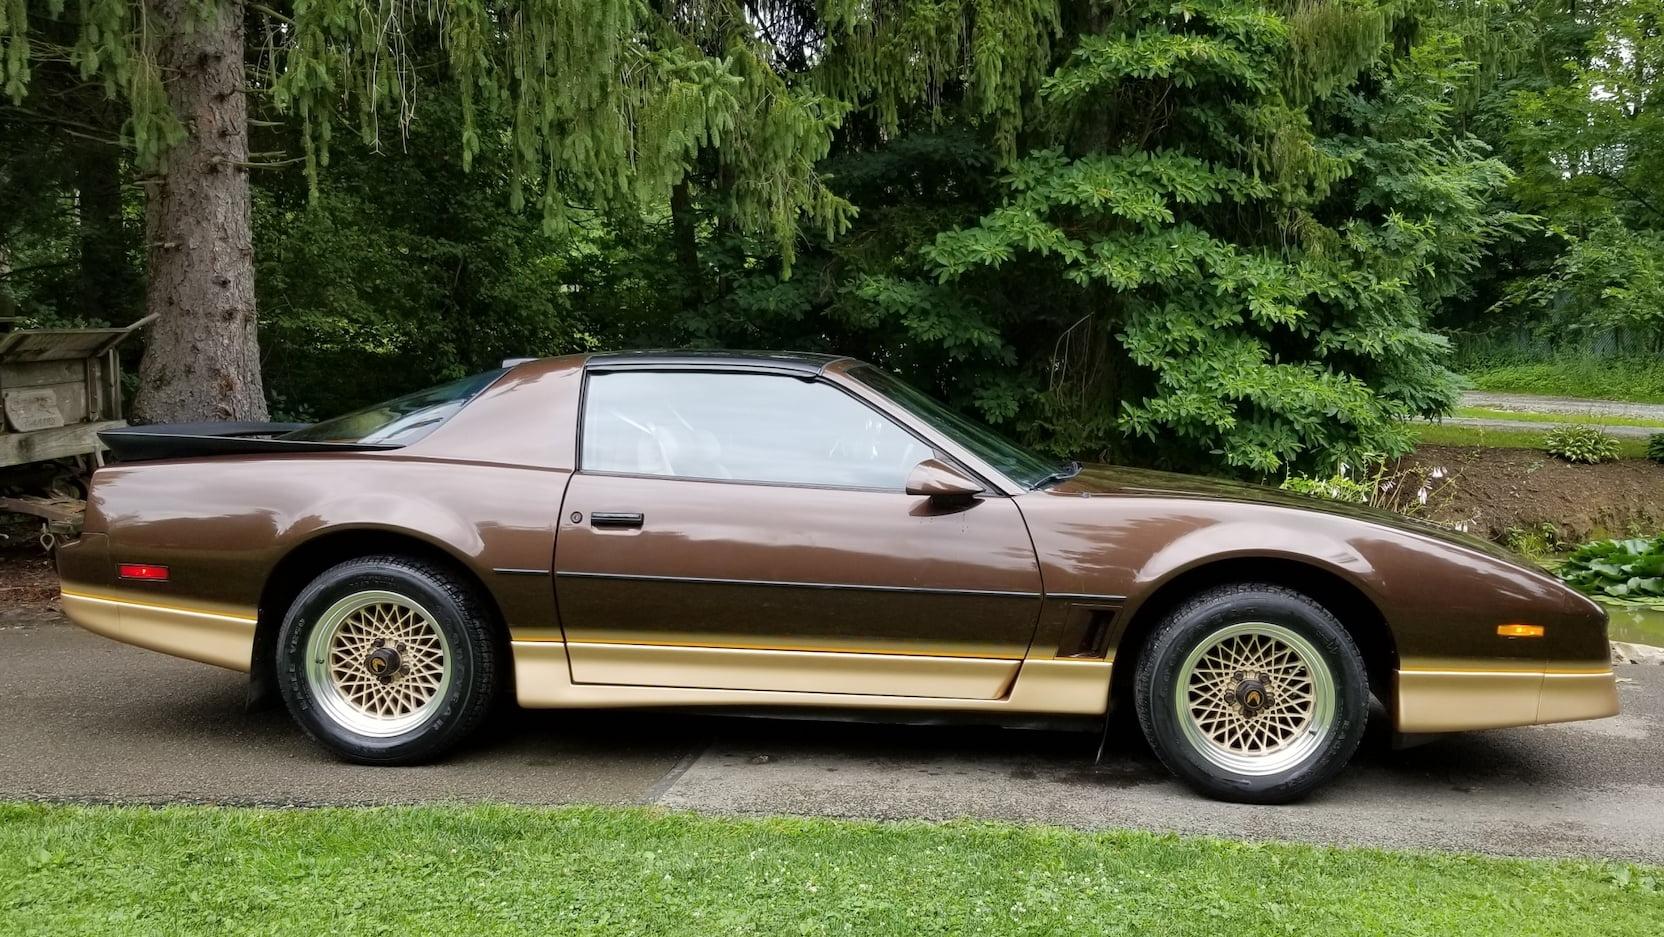 1986 Pontiac Trans Am profile